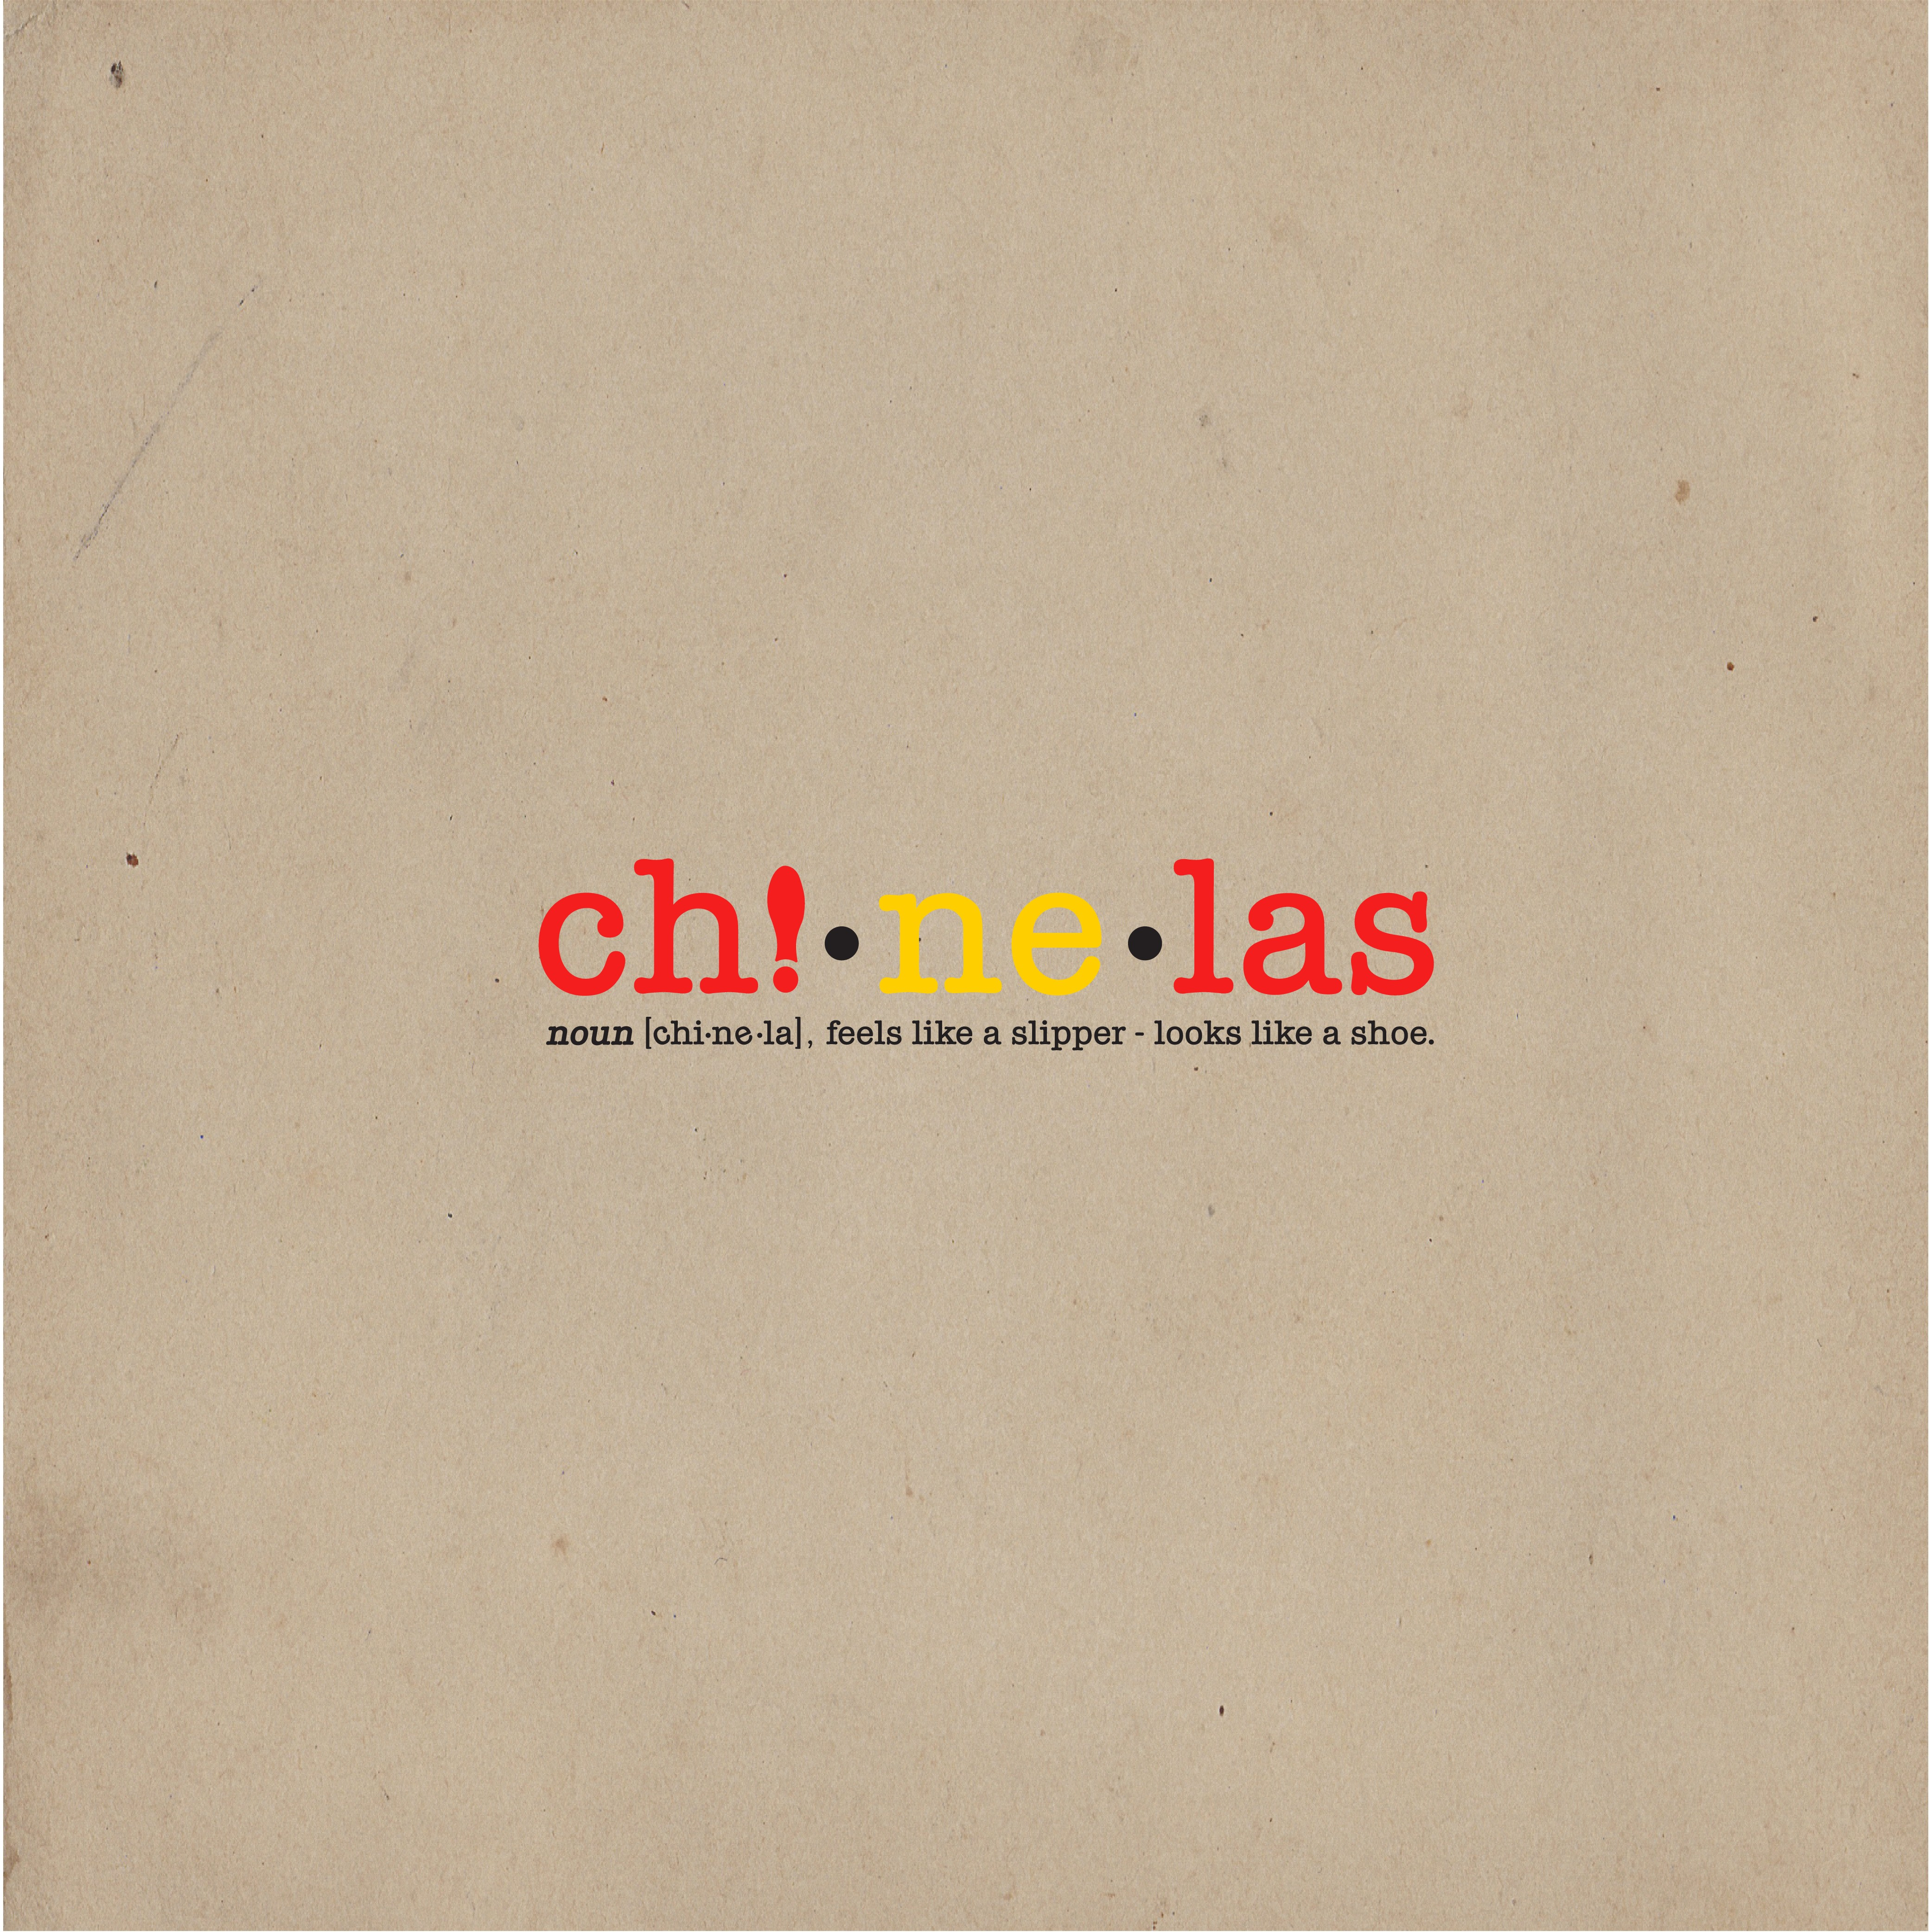 Ch!nelas - help create a logo for a shoe line